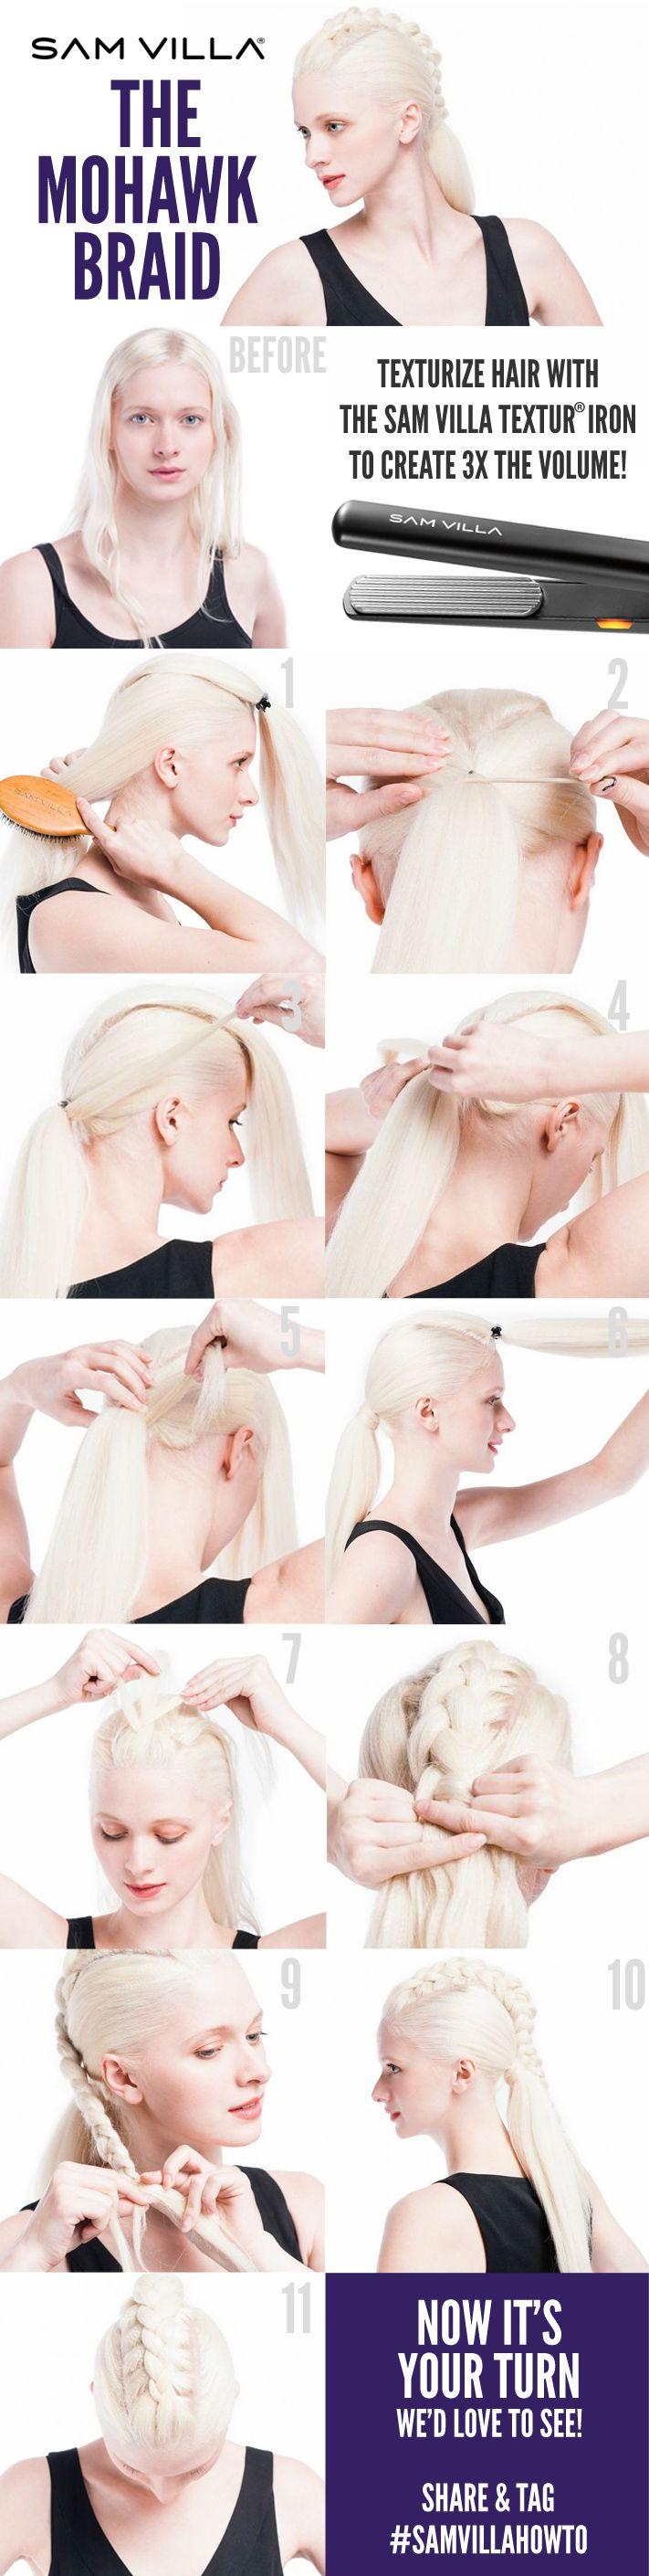 Sam Villa Step-By-Step - The Mohawk Braid Hairstyle